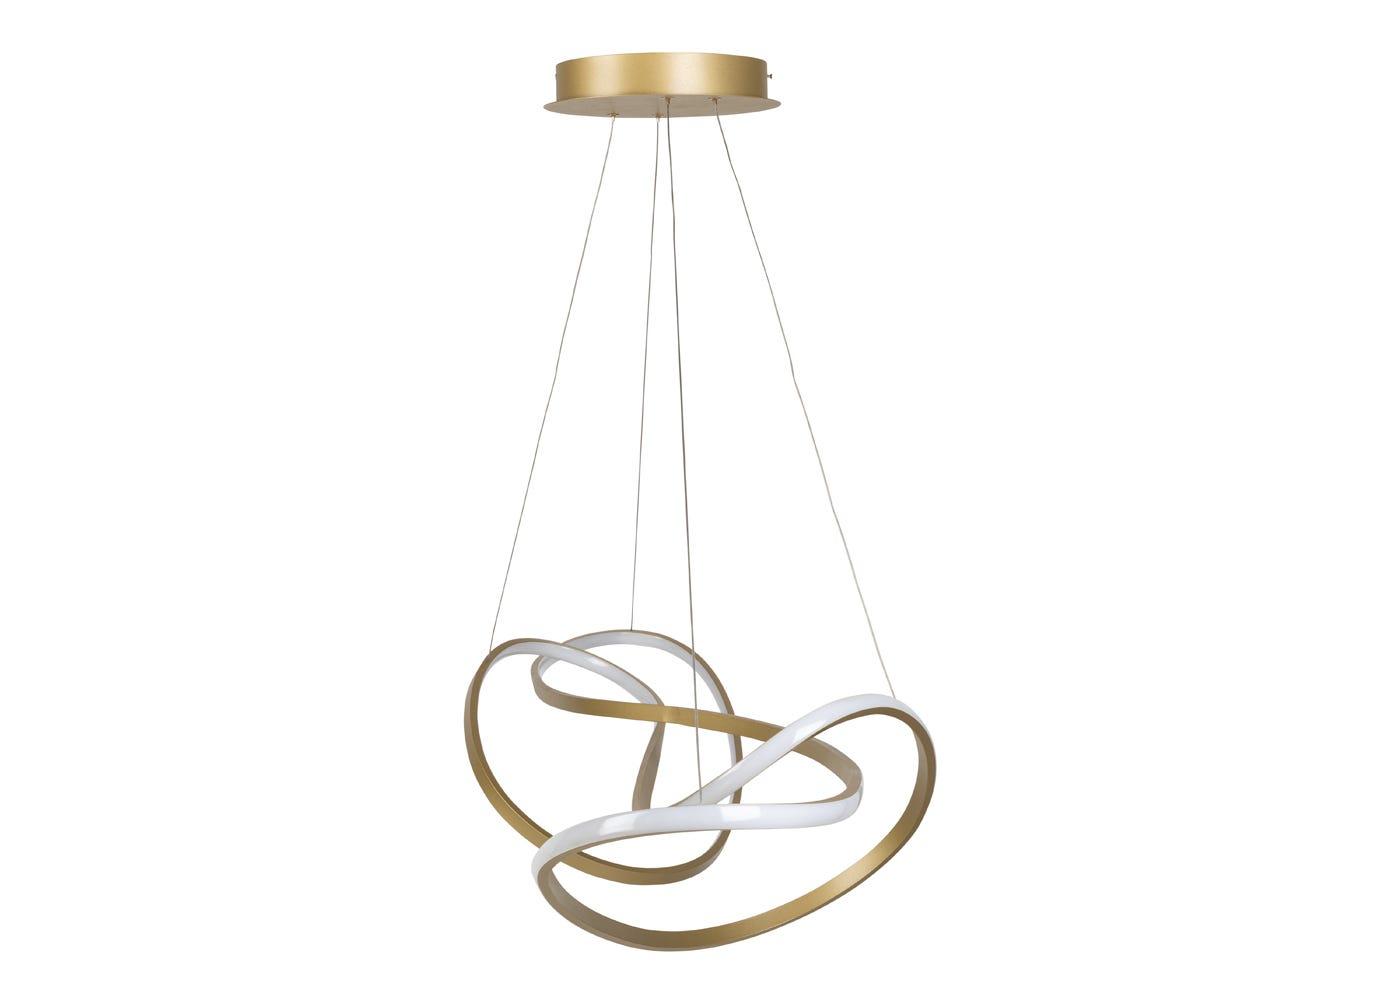 As shown: RIbbon LED Ceiling Pendant XL Satin Gold - Side profile.